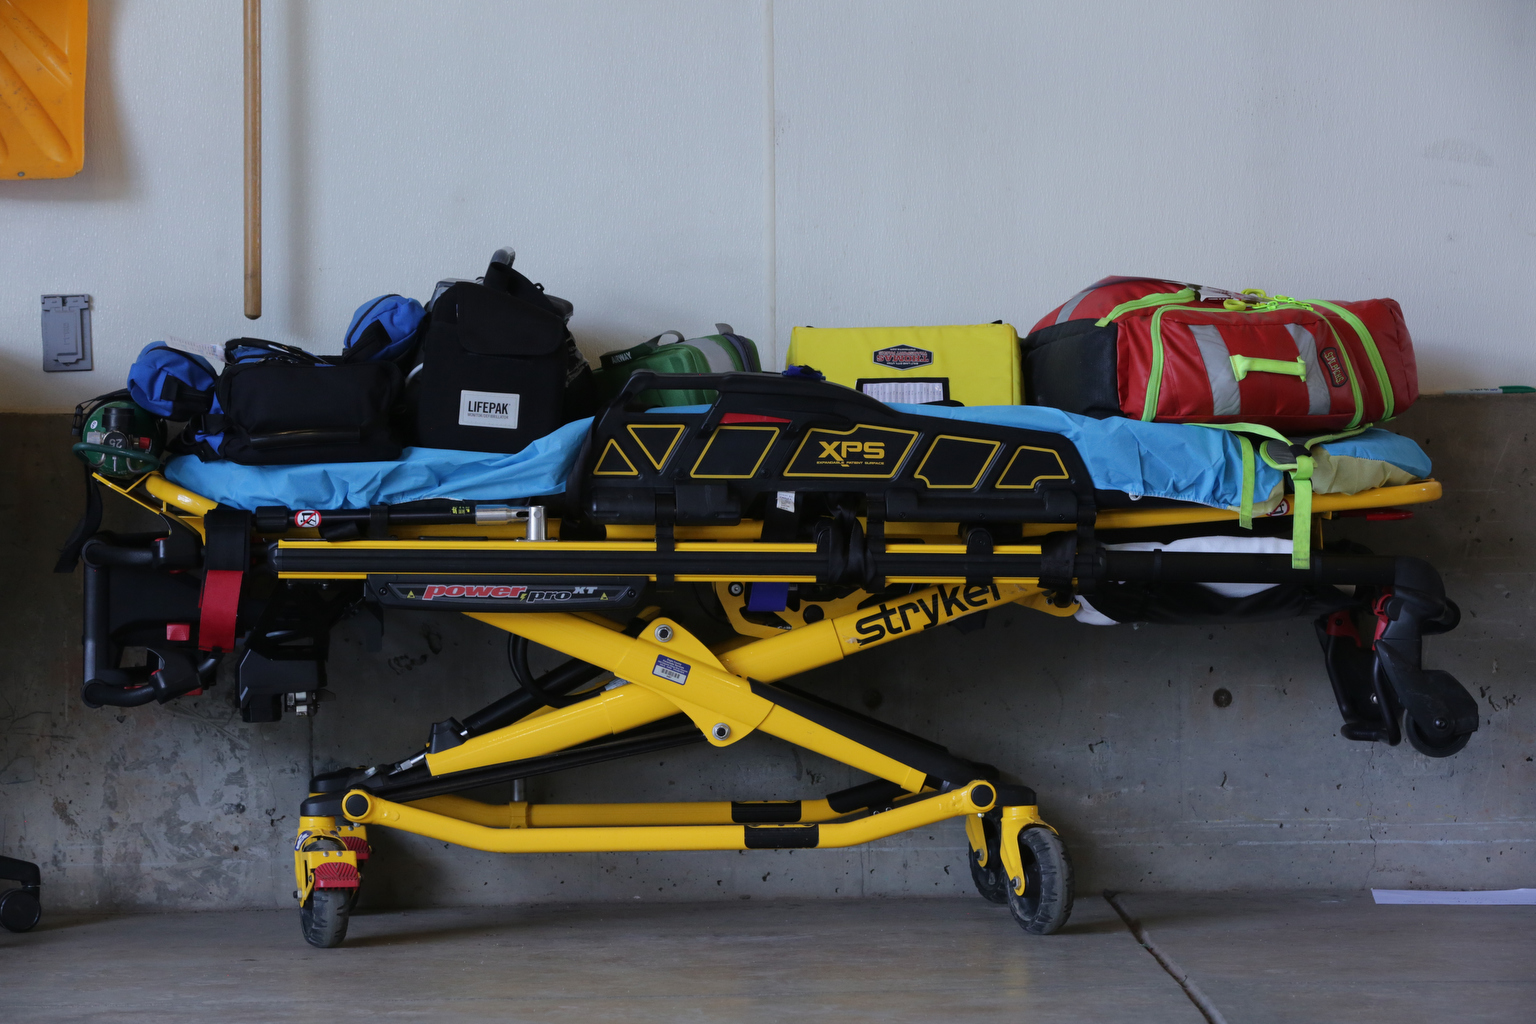 Eagle County Paramedics in Avon, Colorado